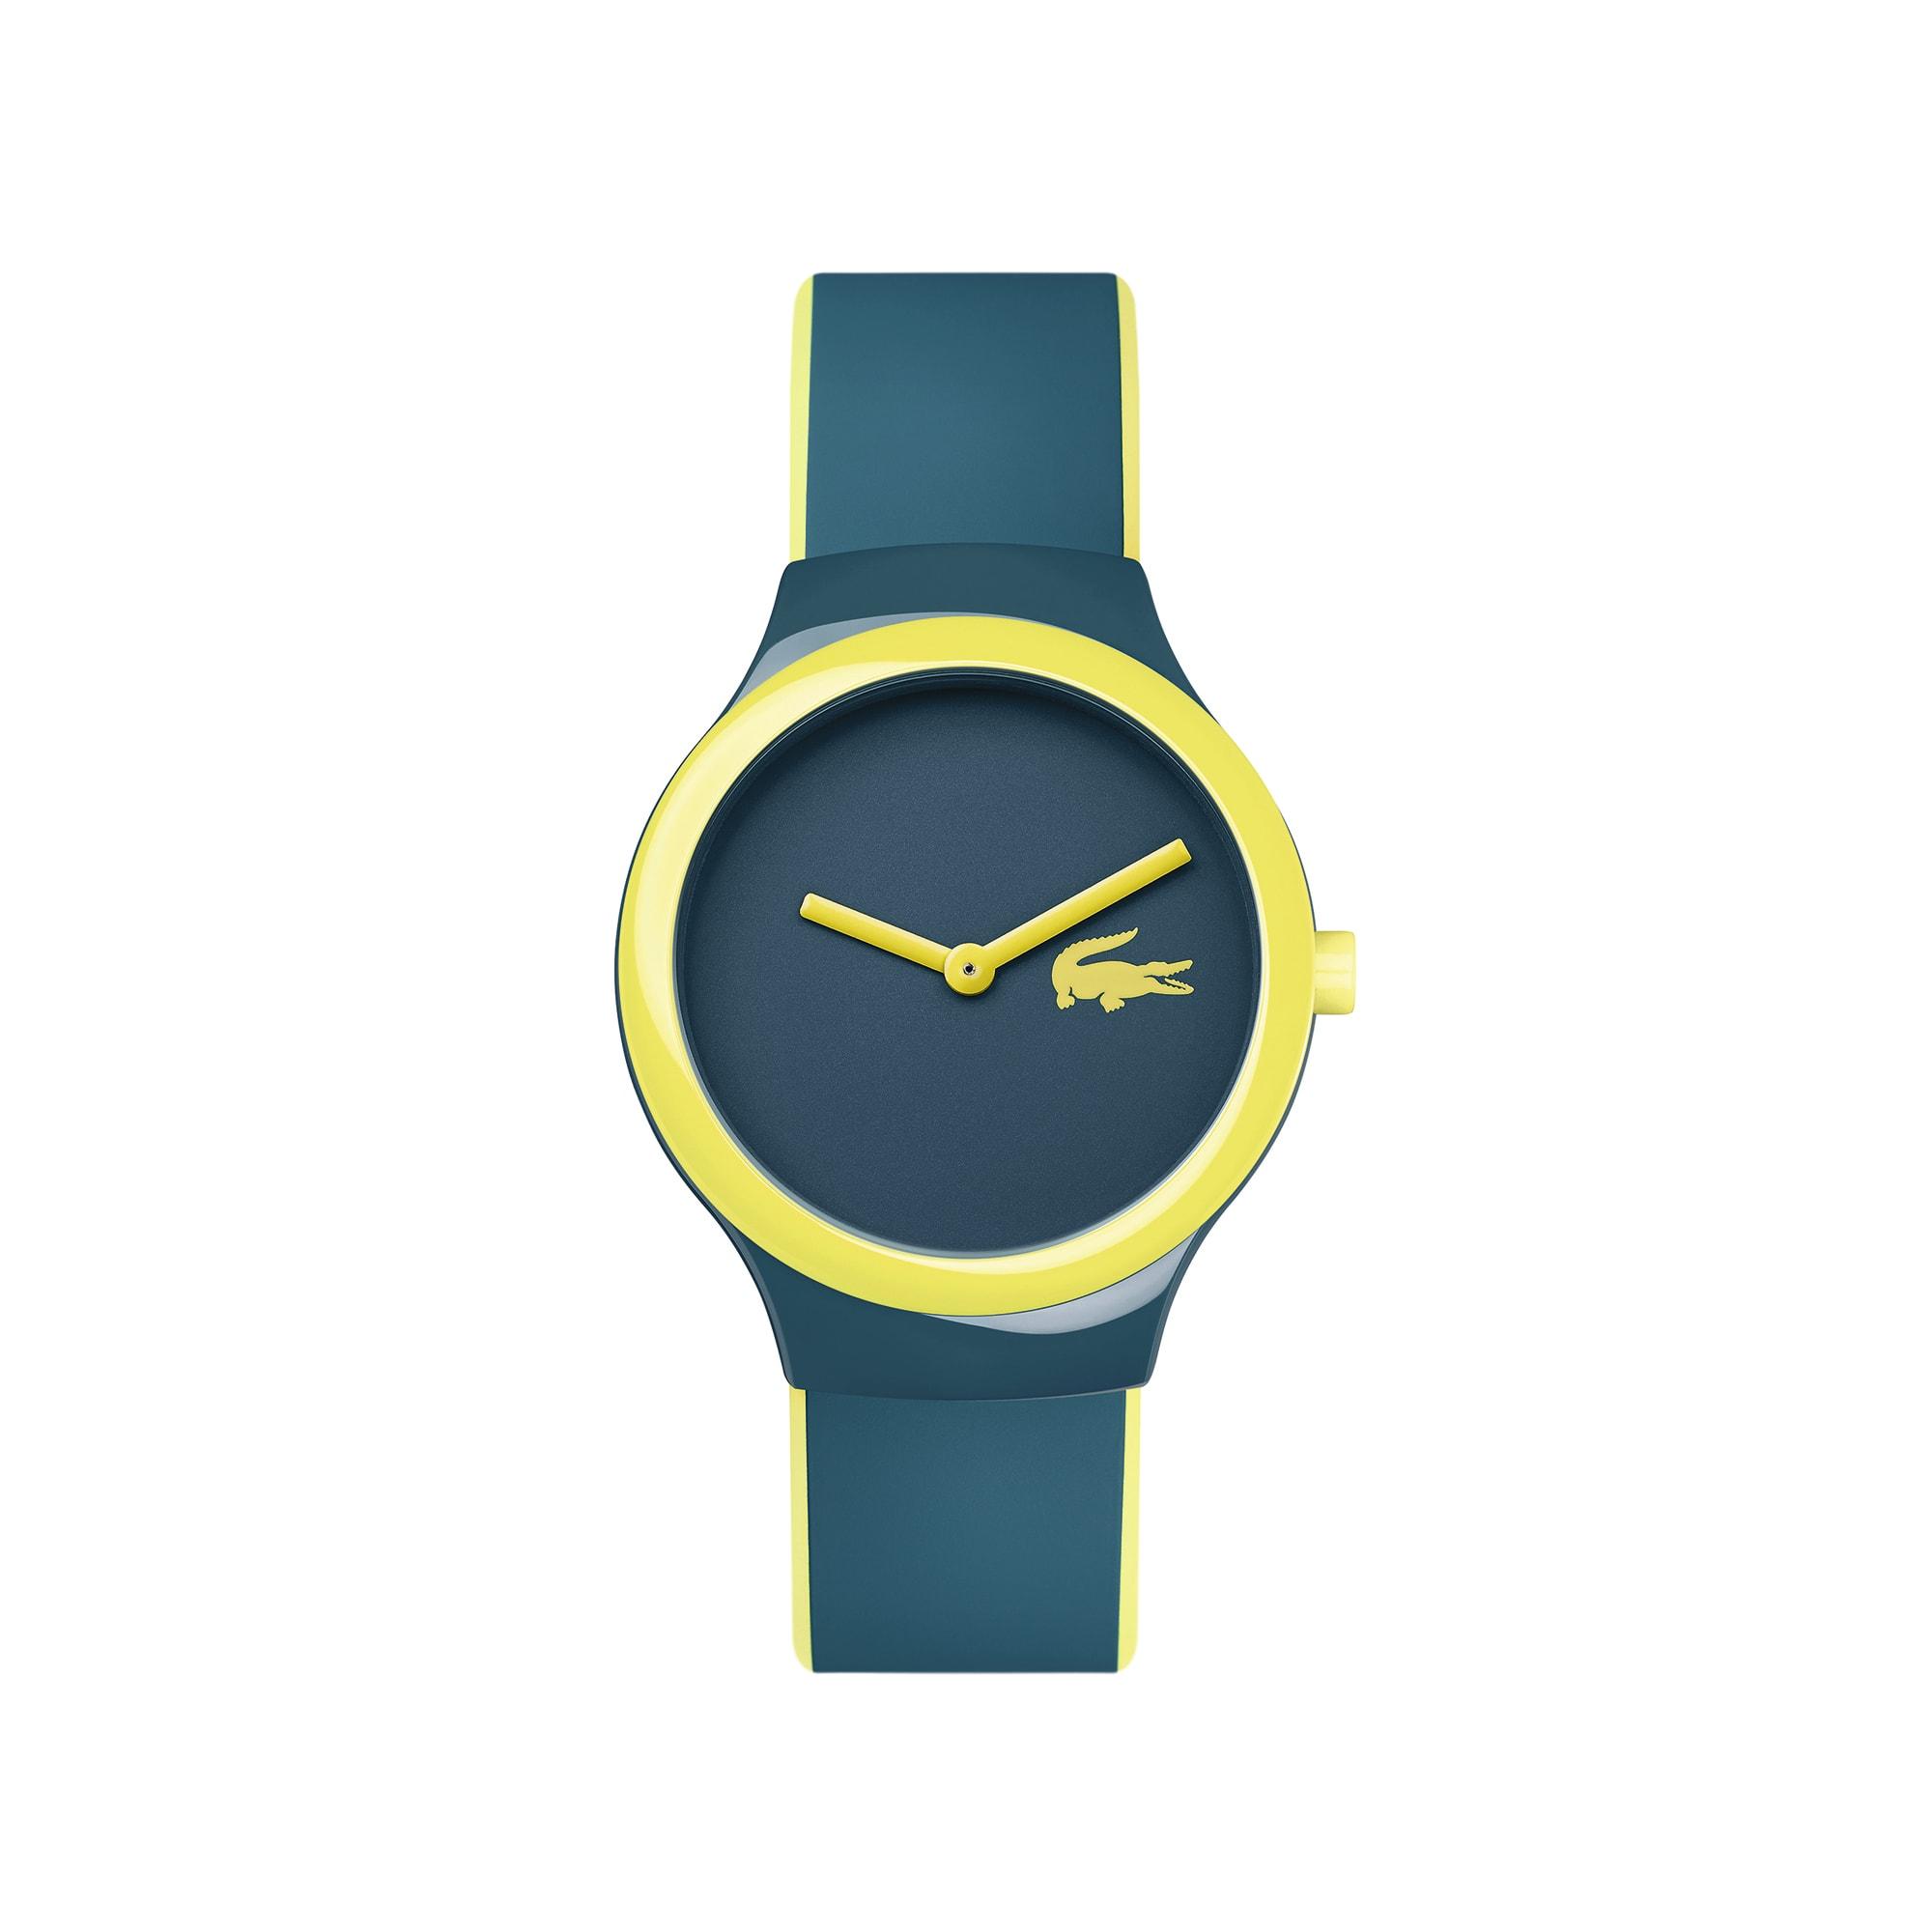 Montre Goa new bleue-grise et jaune